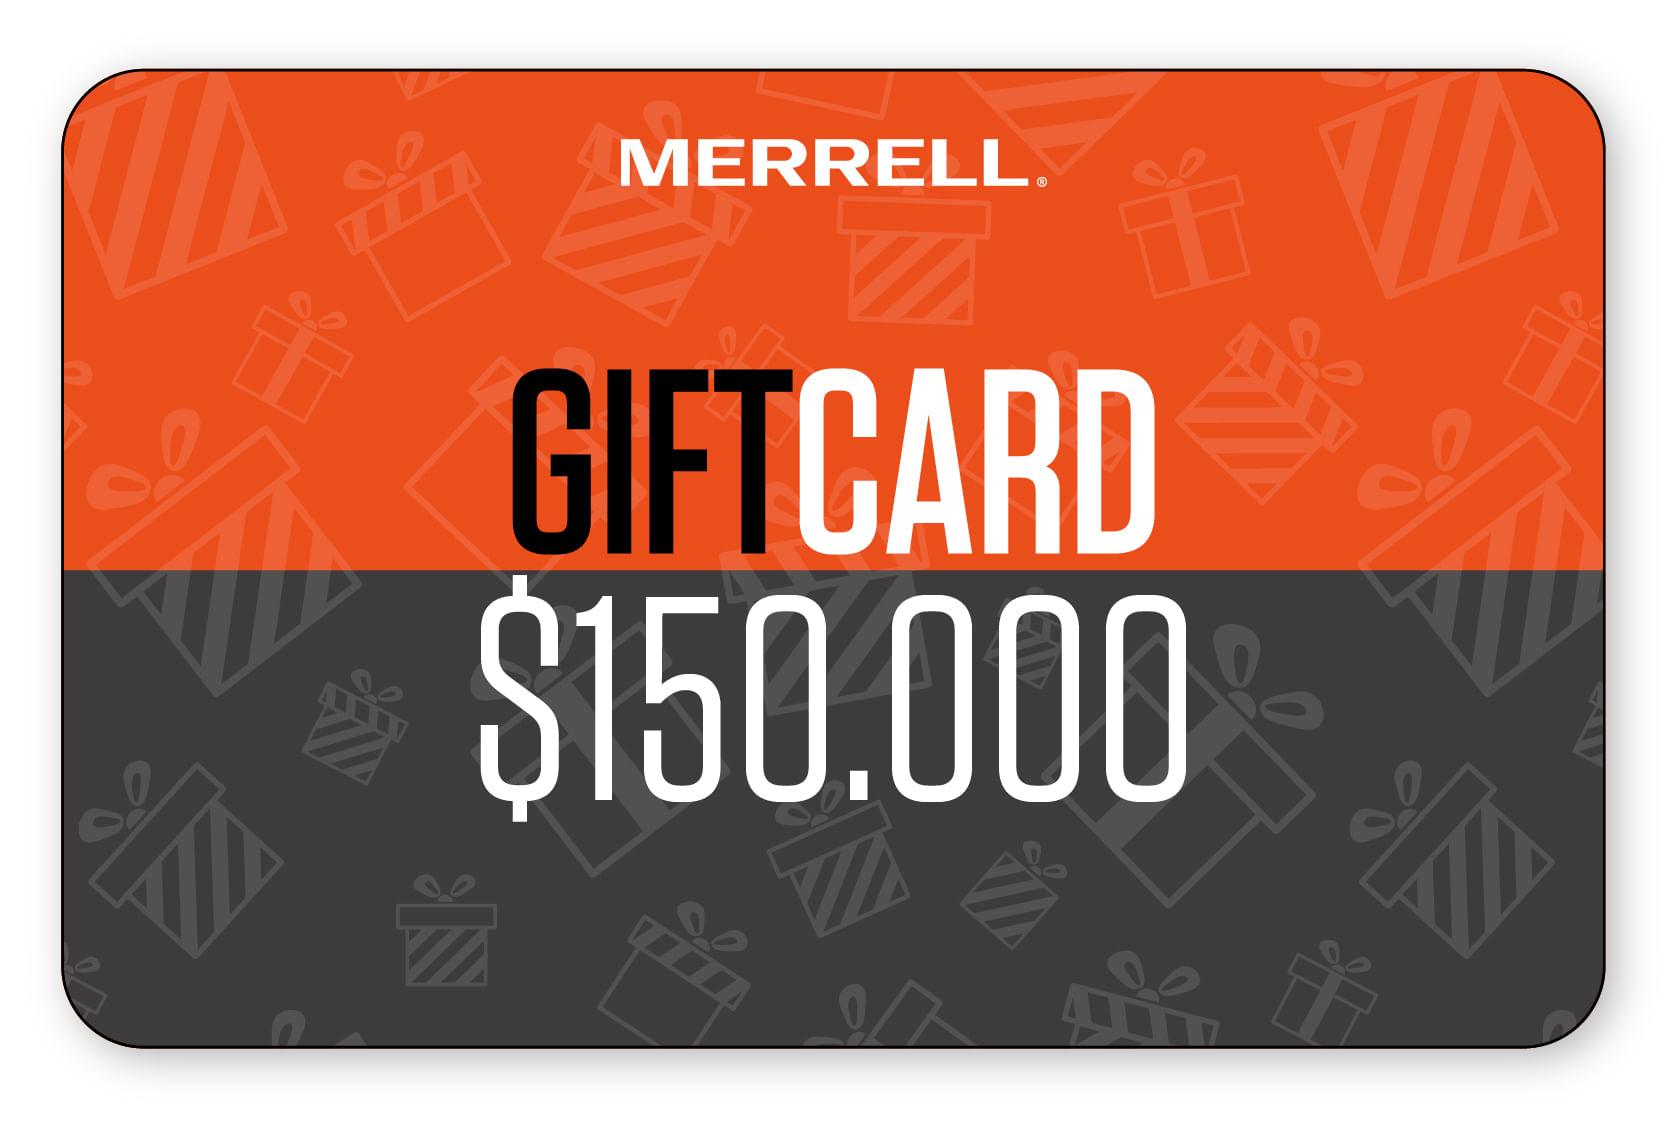 Gift Card $150.000